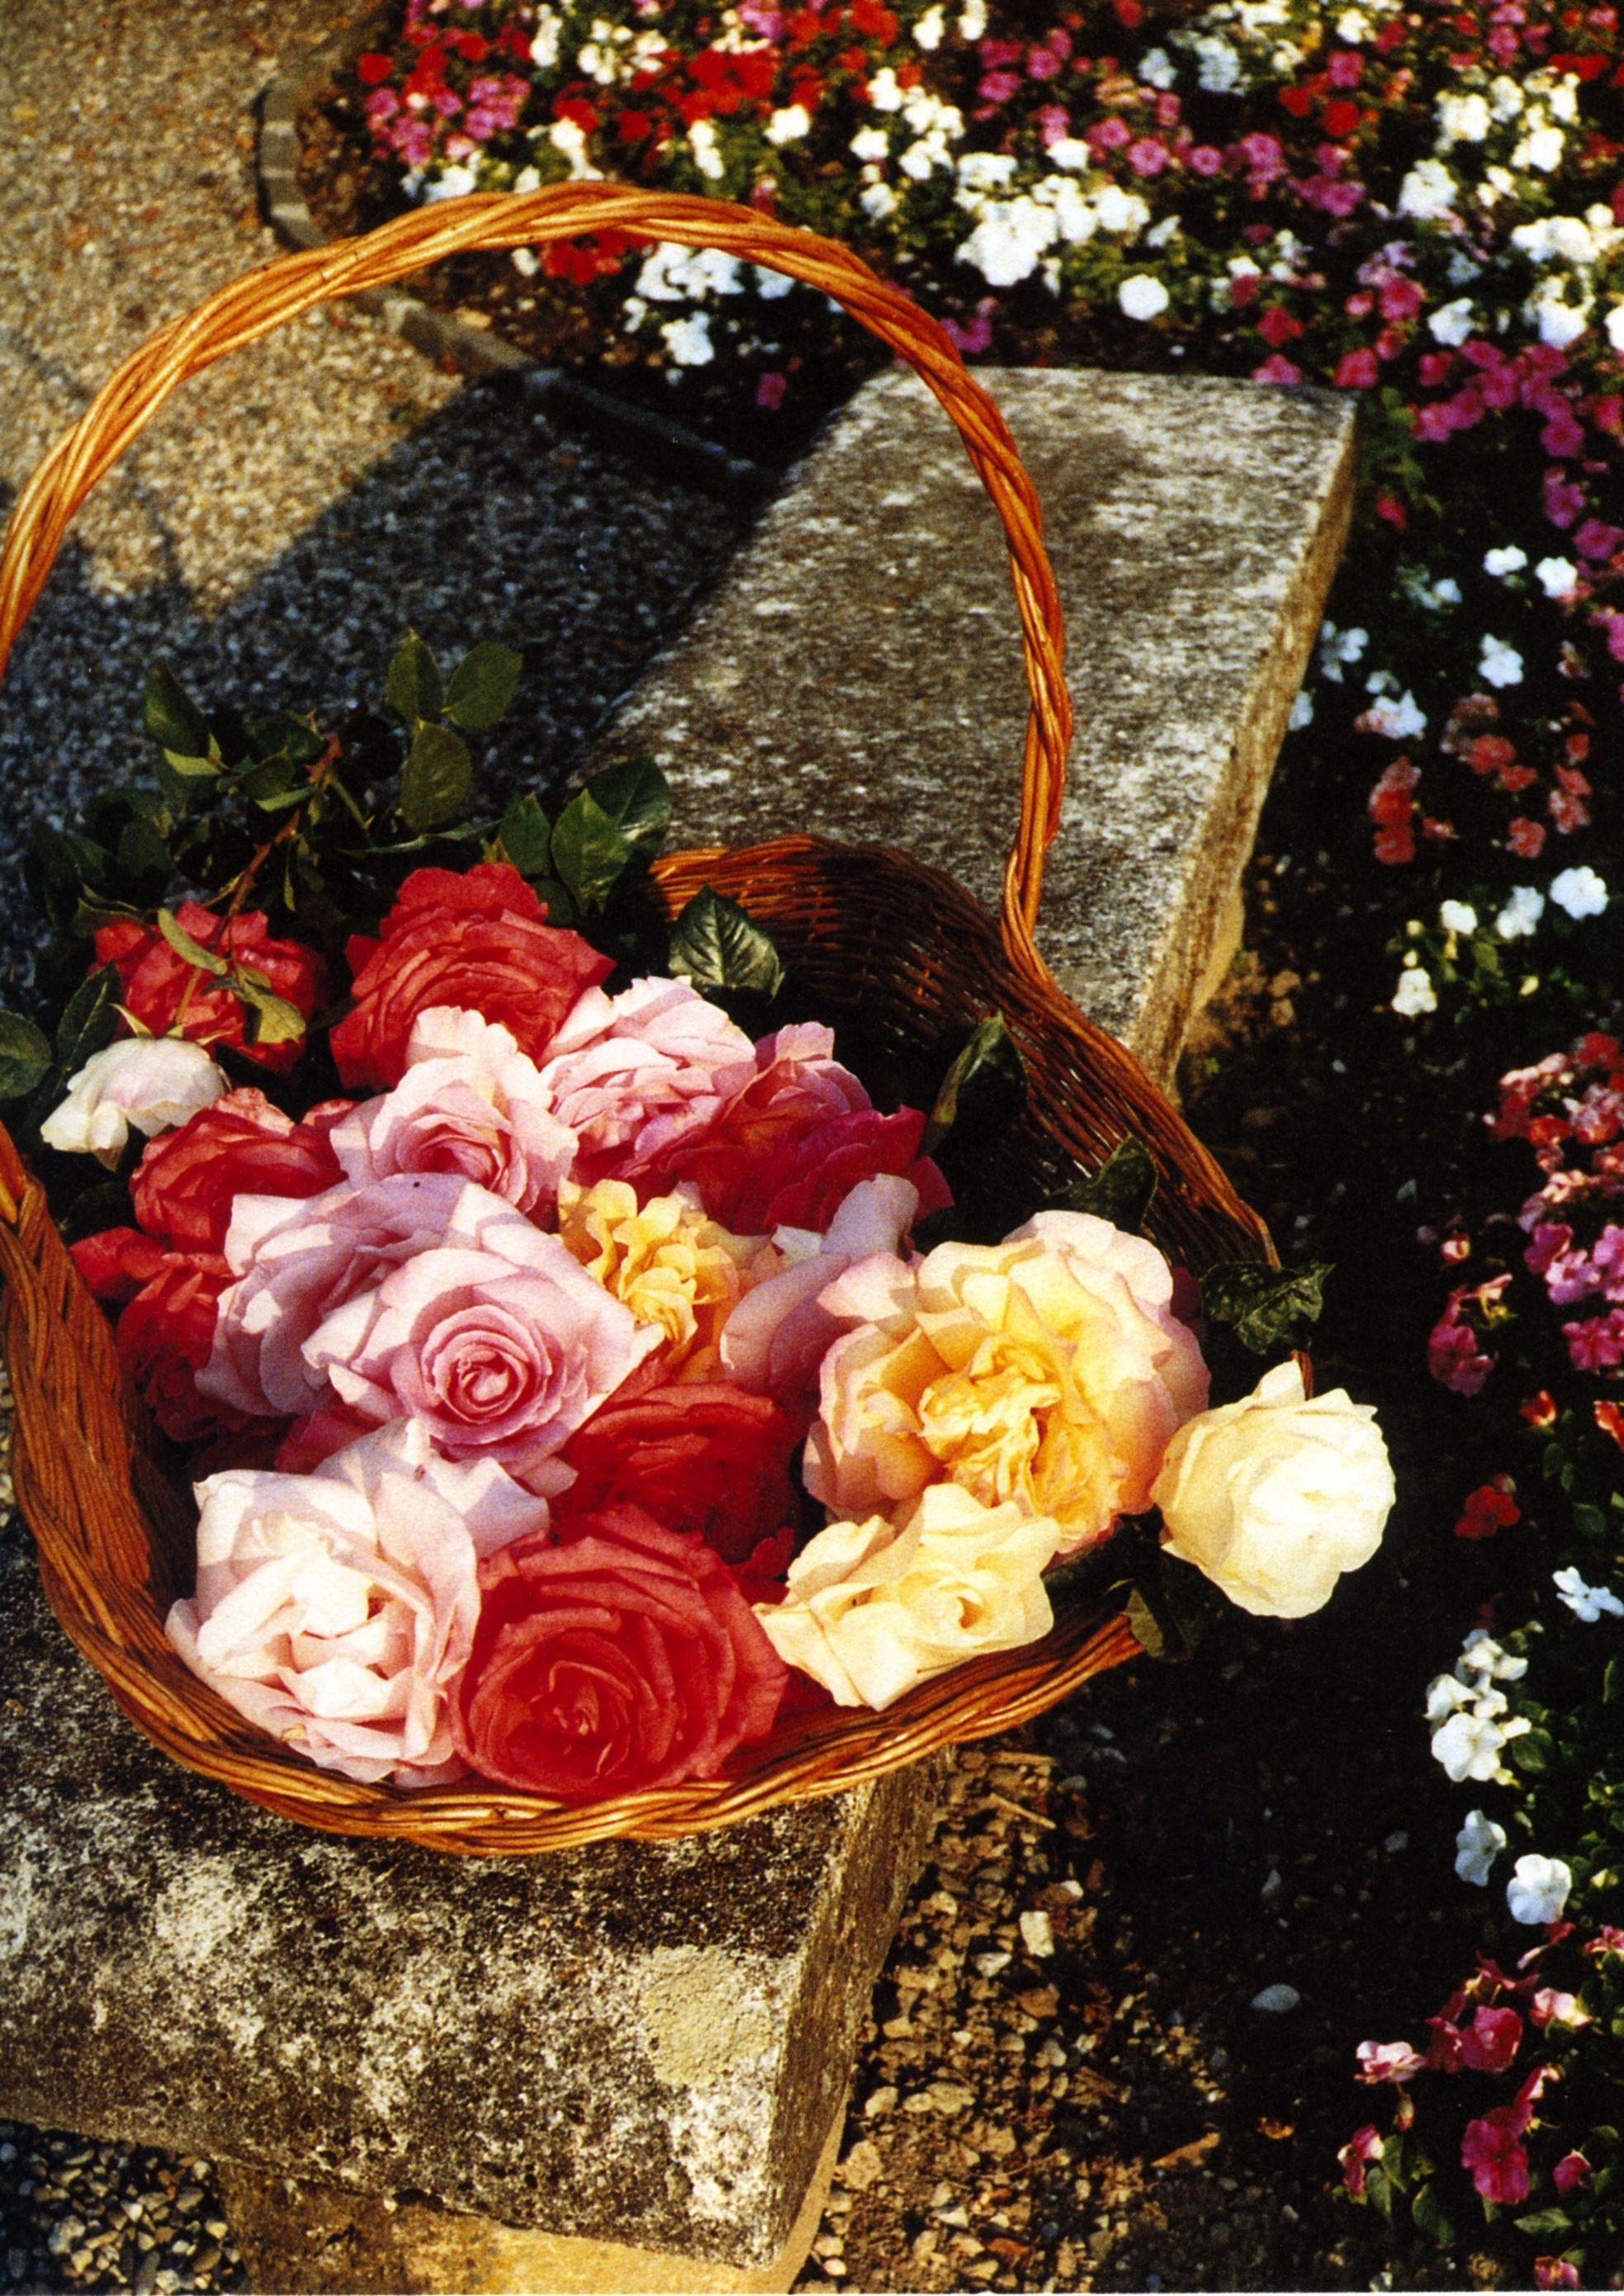 By Audrey Hepburn Pink Flower Pinterest Audrey Hepburn Plants